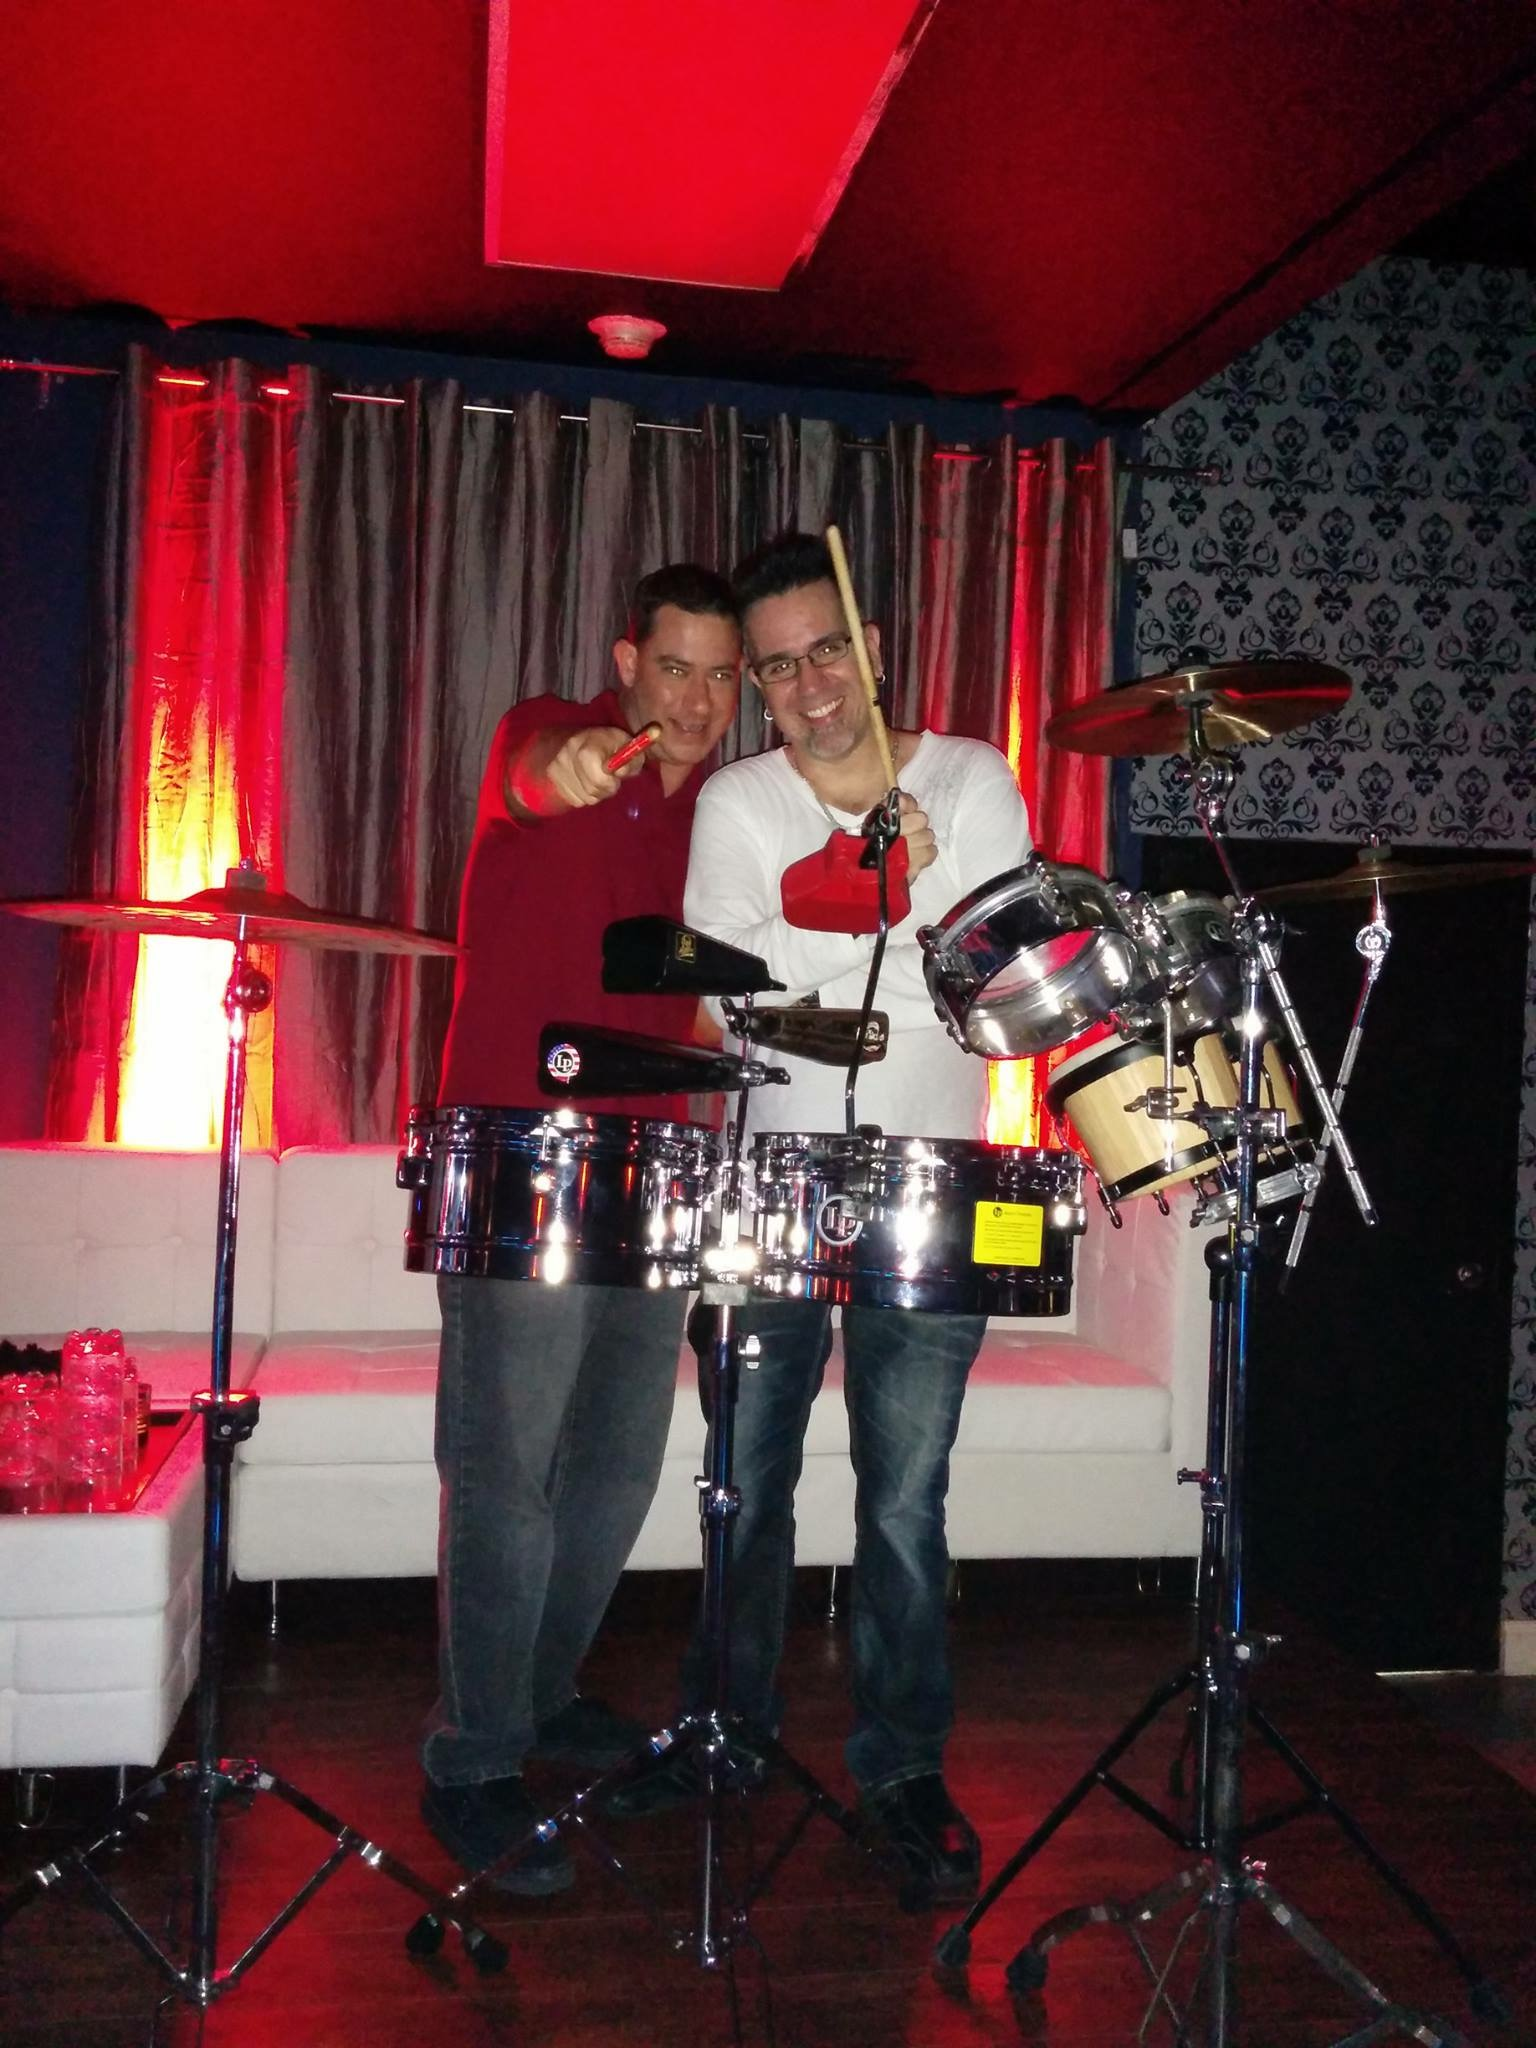 Panos and Noiz